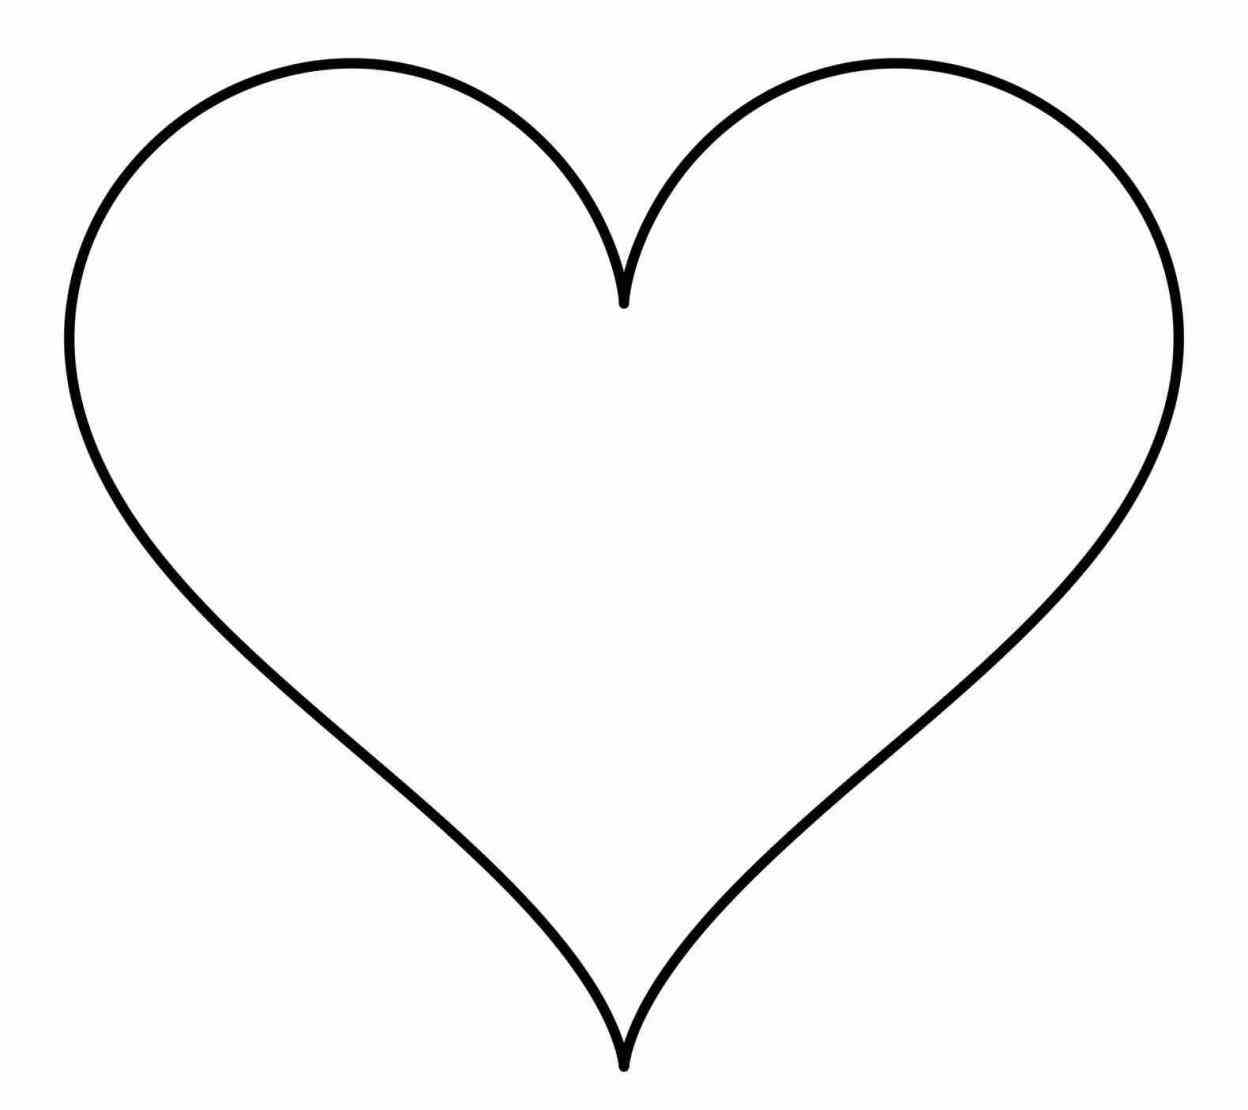 1248x1110 Simple Heart Drawings With Roses Urldircom